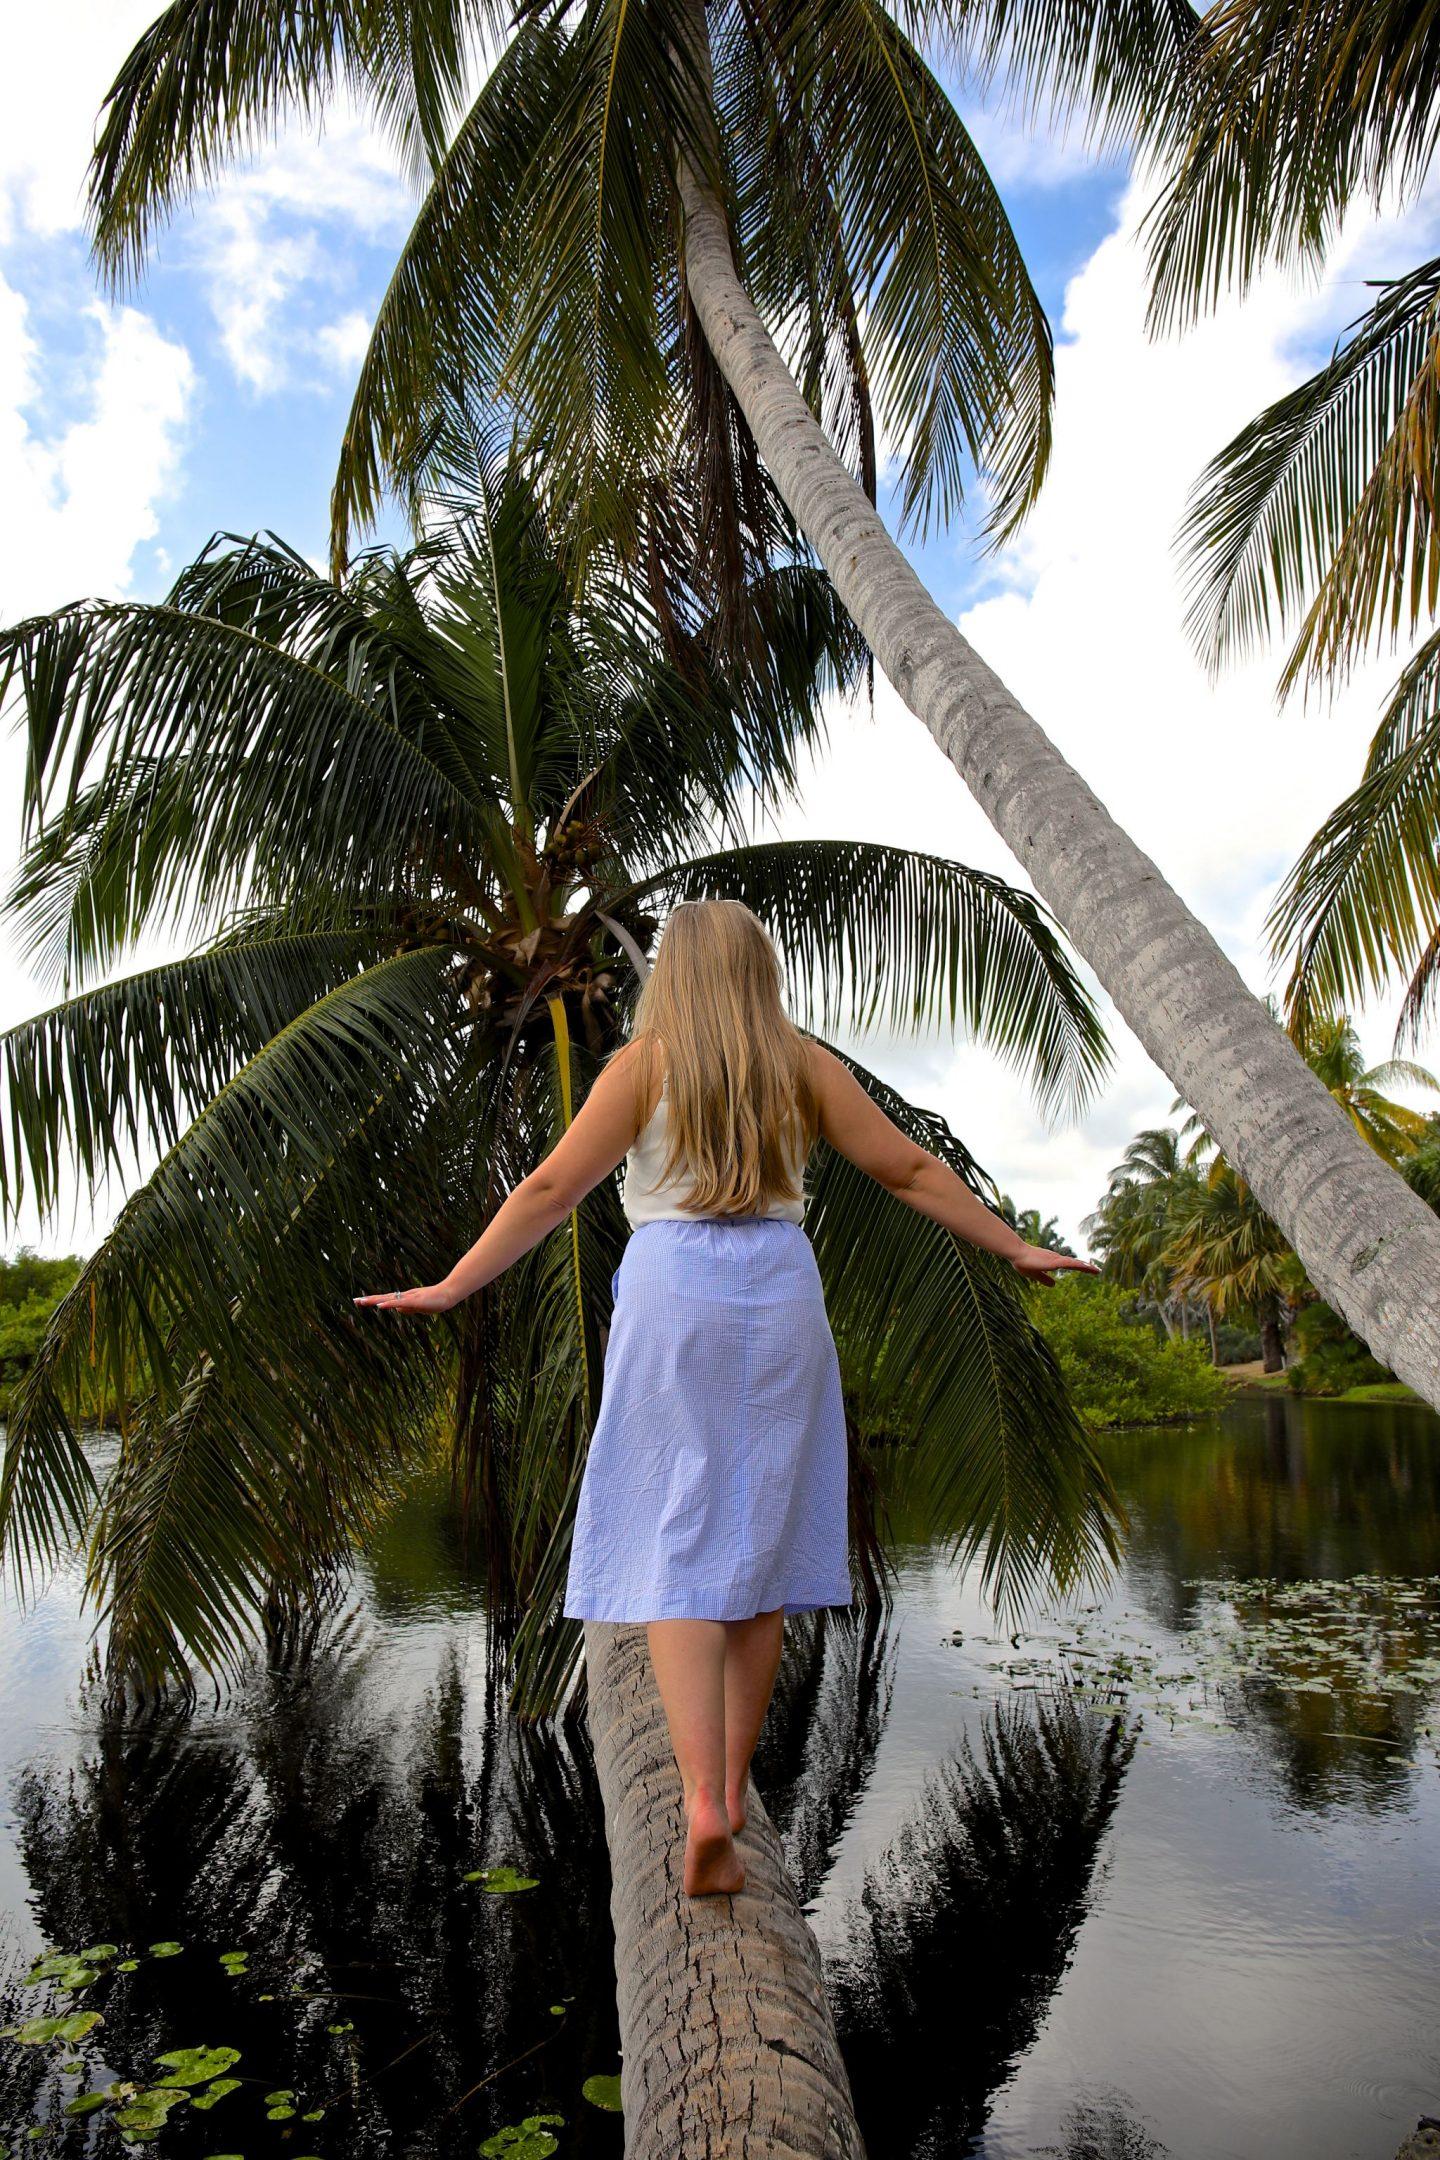 Queen Elizabeth II Botanical Gardens, Grand Cayman, Katie Heath, KALANCHOE